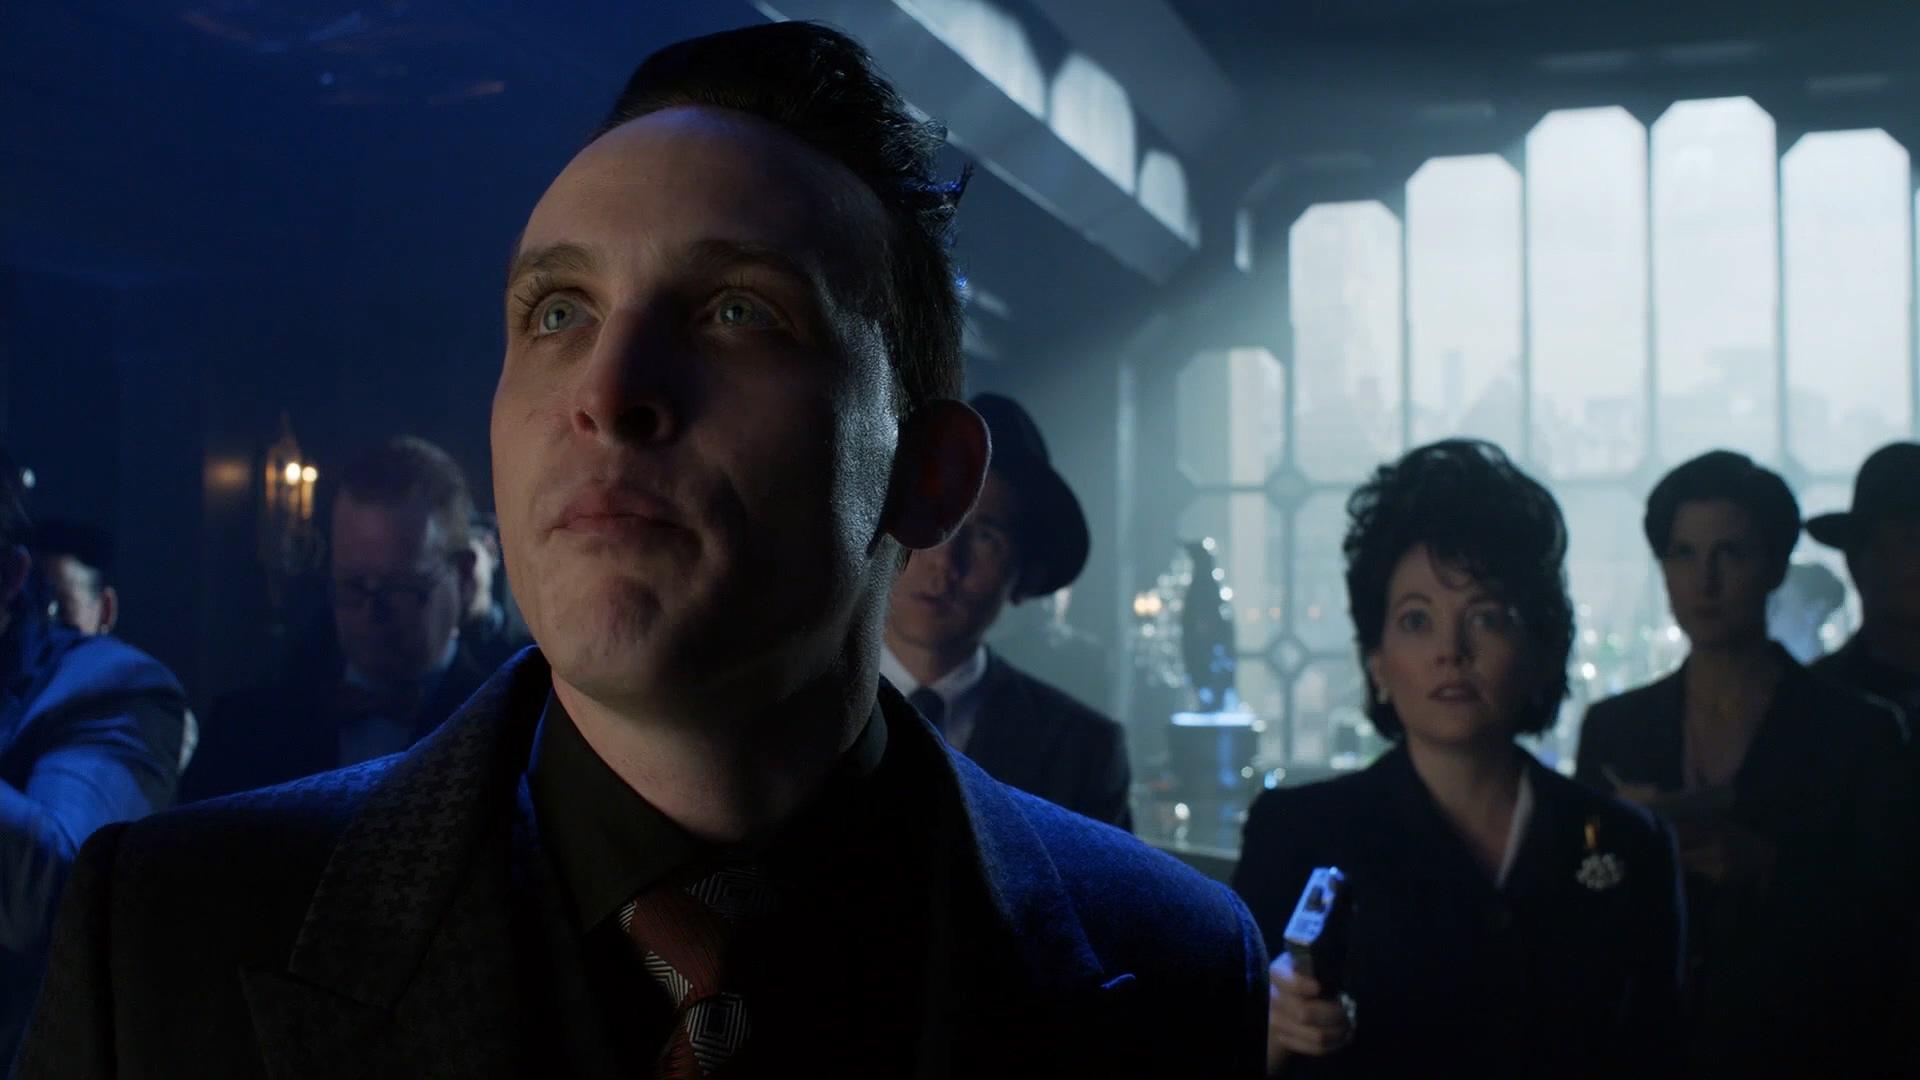 Готэм / Gotham [04x01-12 из 22] (2017) WEB-DLRip 1080p